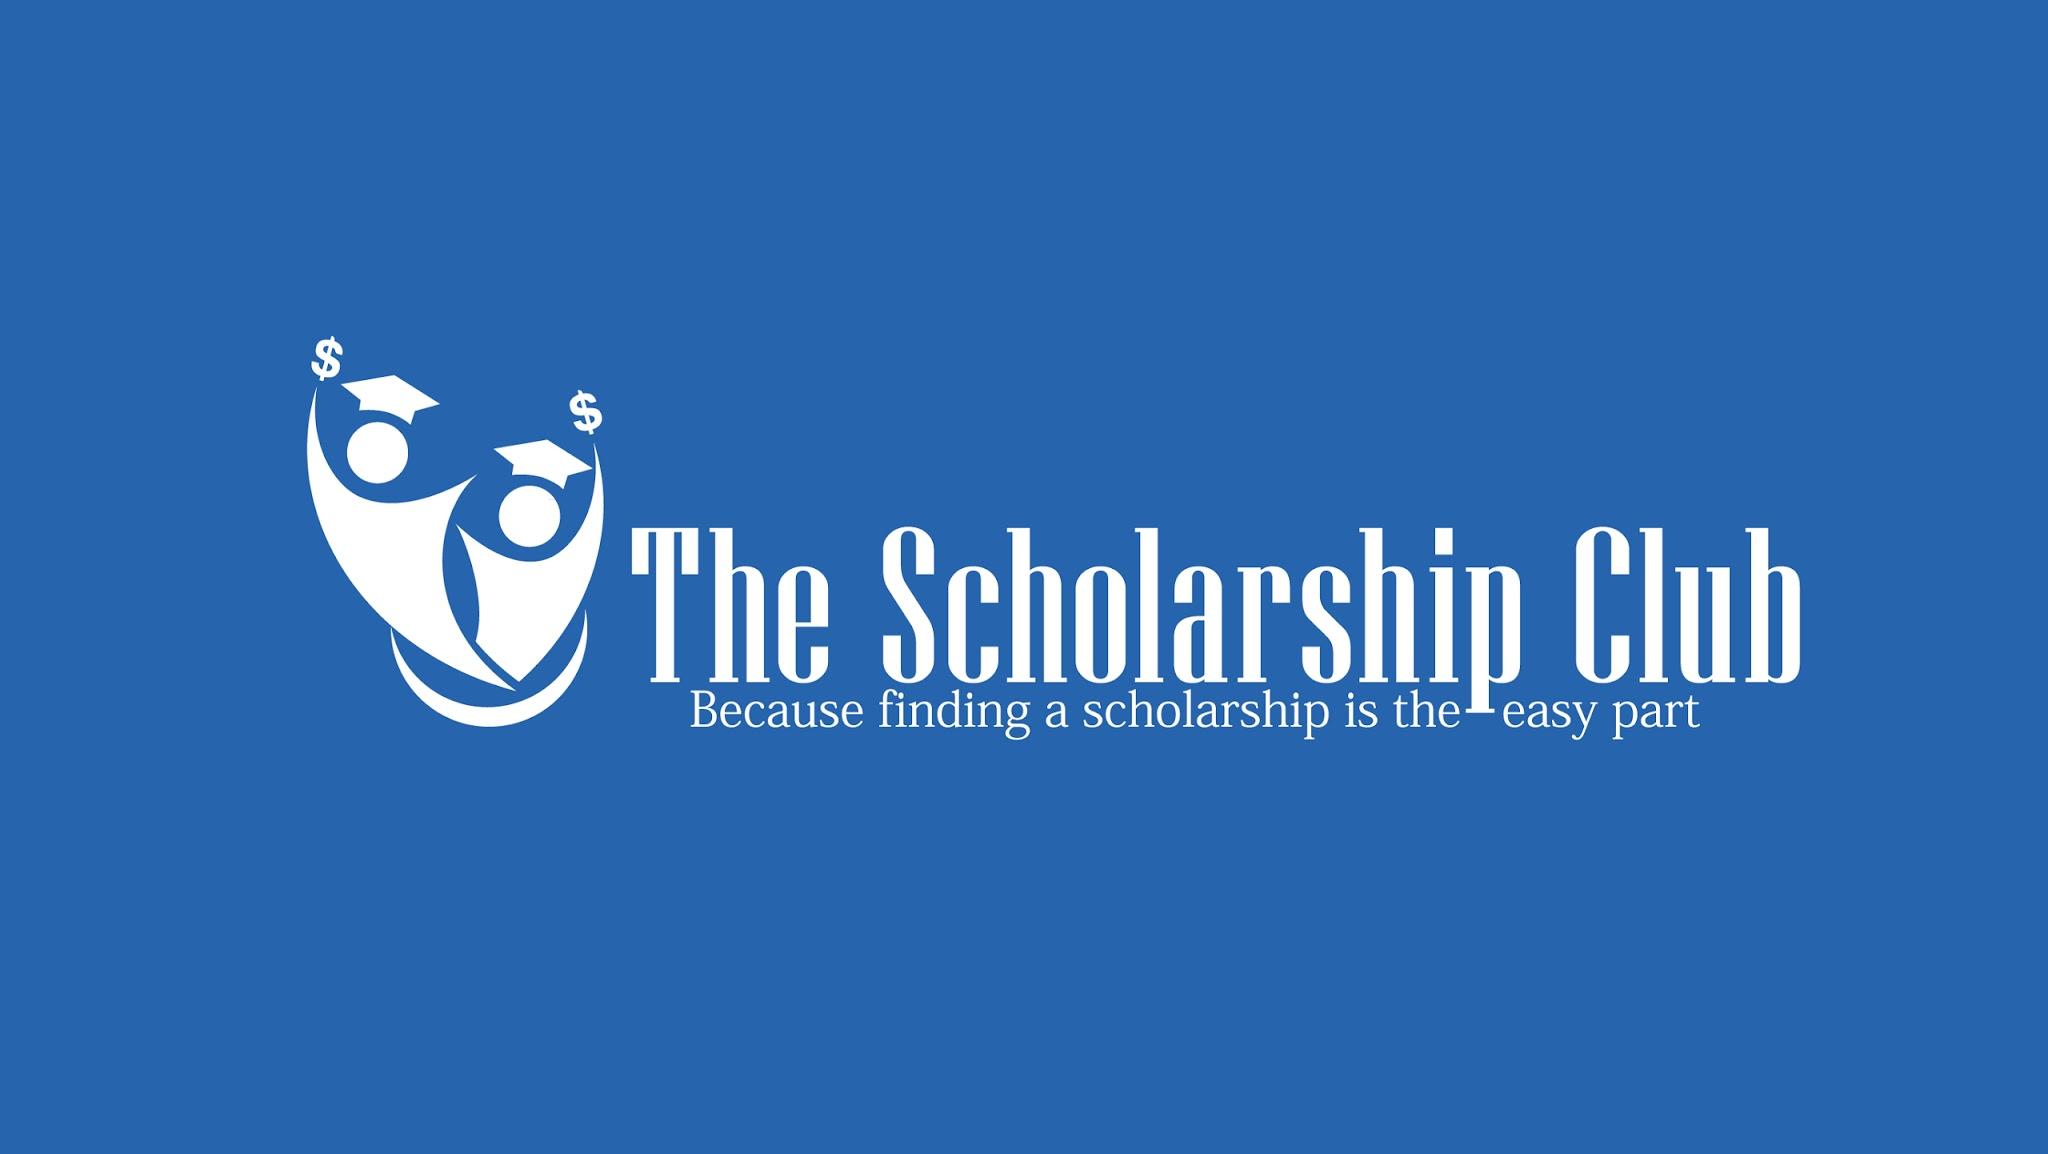 The Scholarship Club FPC